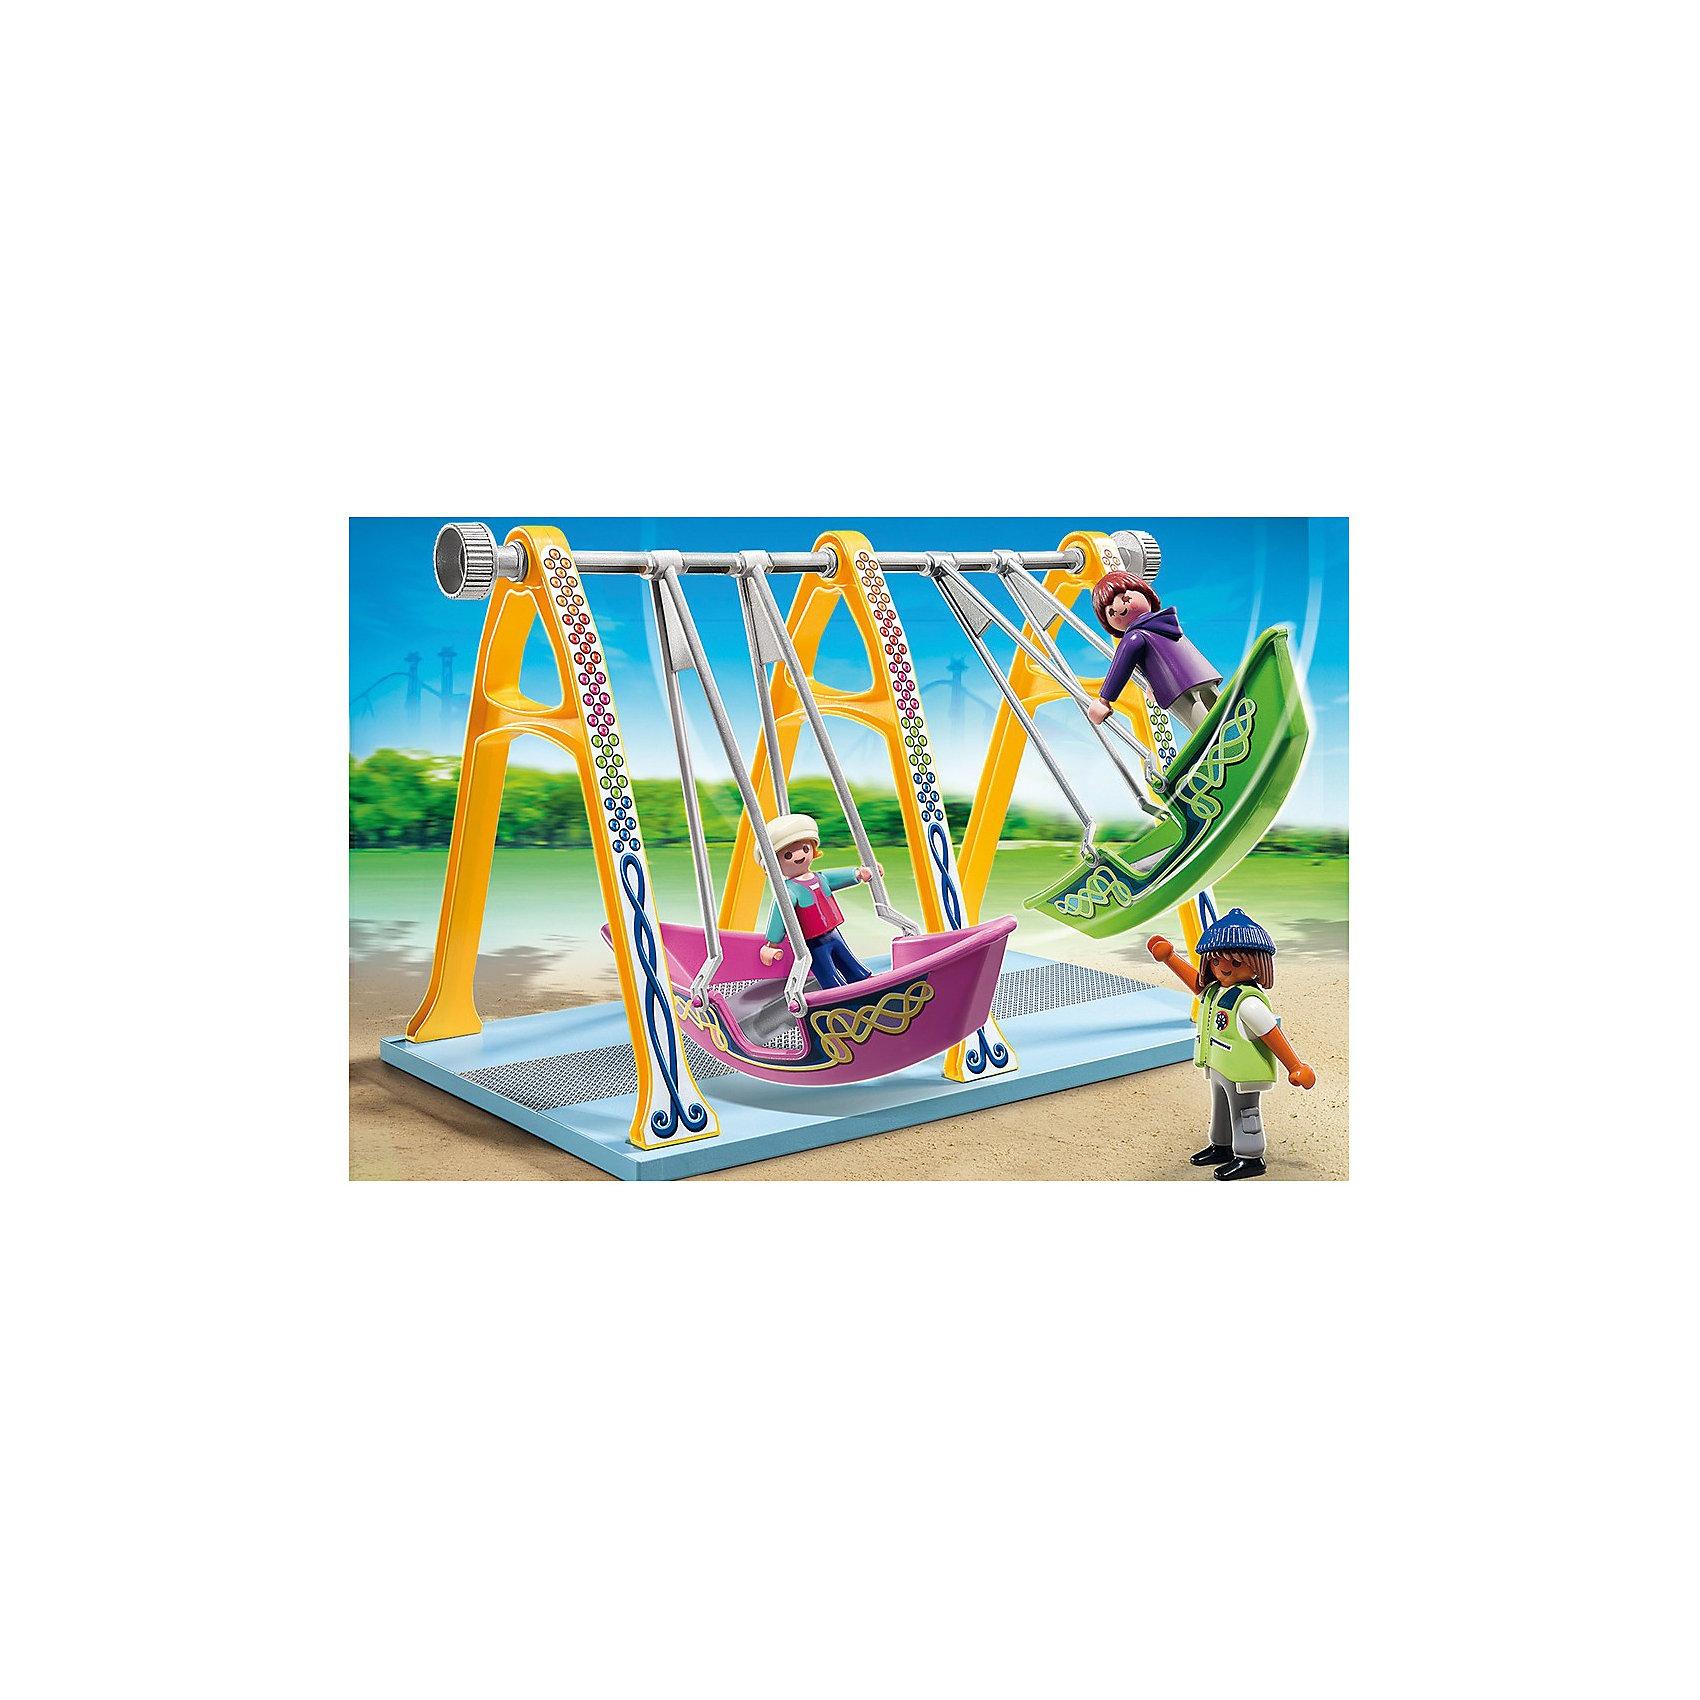 PLAYMOBIL® PLAYMOBIL 5553 Парк Развлечений: Аттракцион Лодка конструкторы playmobil лодка с браконьерами